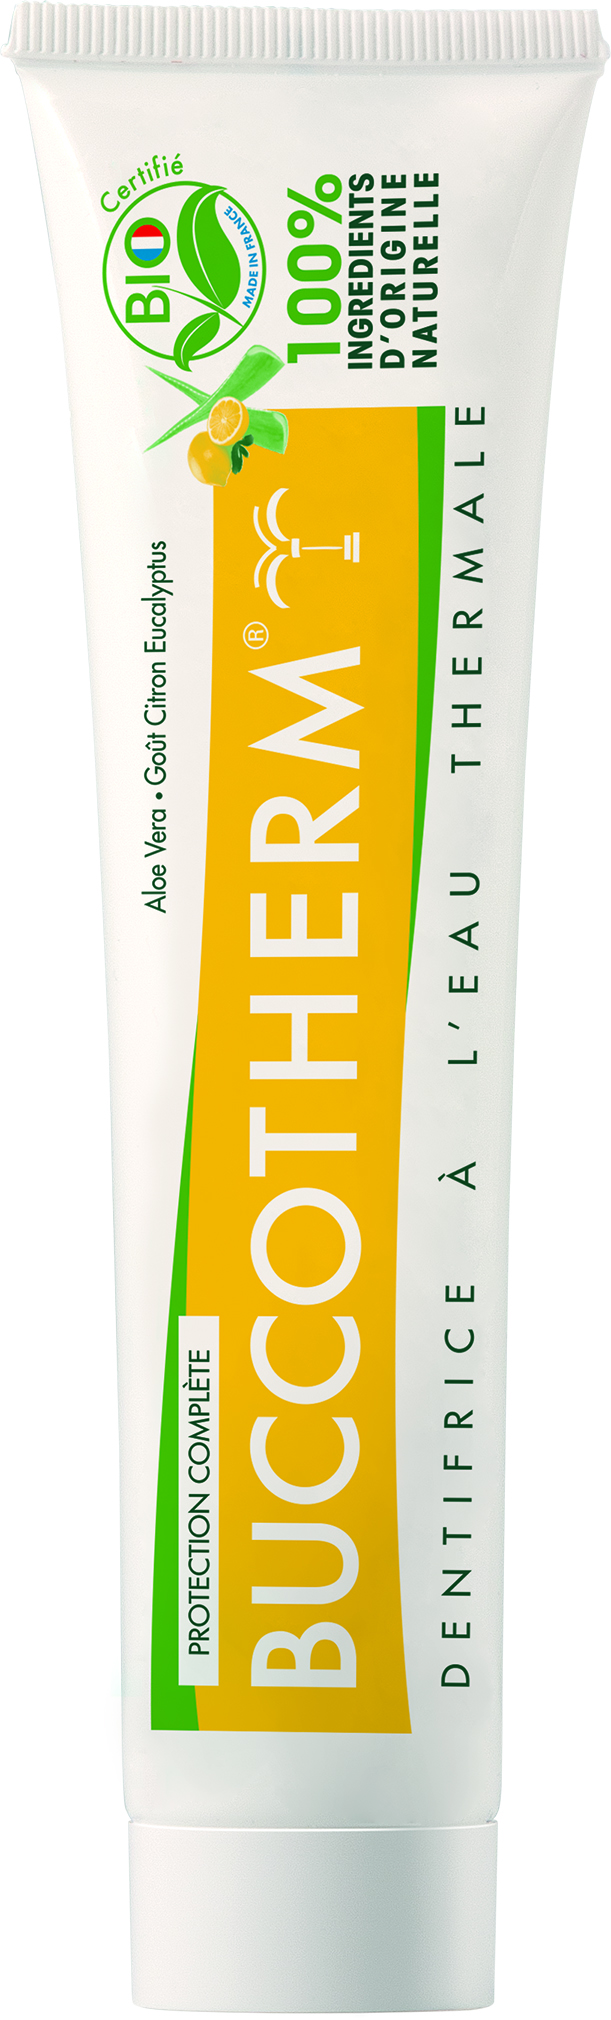 Dentifrice protection complète bio au citron eucalyptus